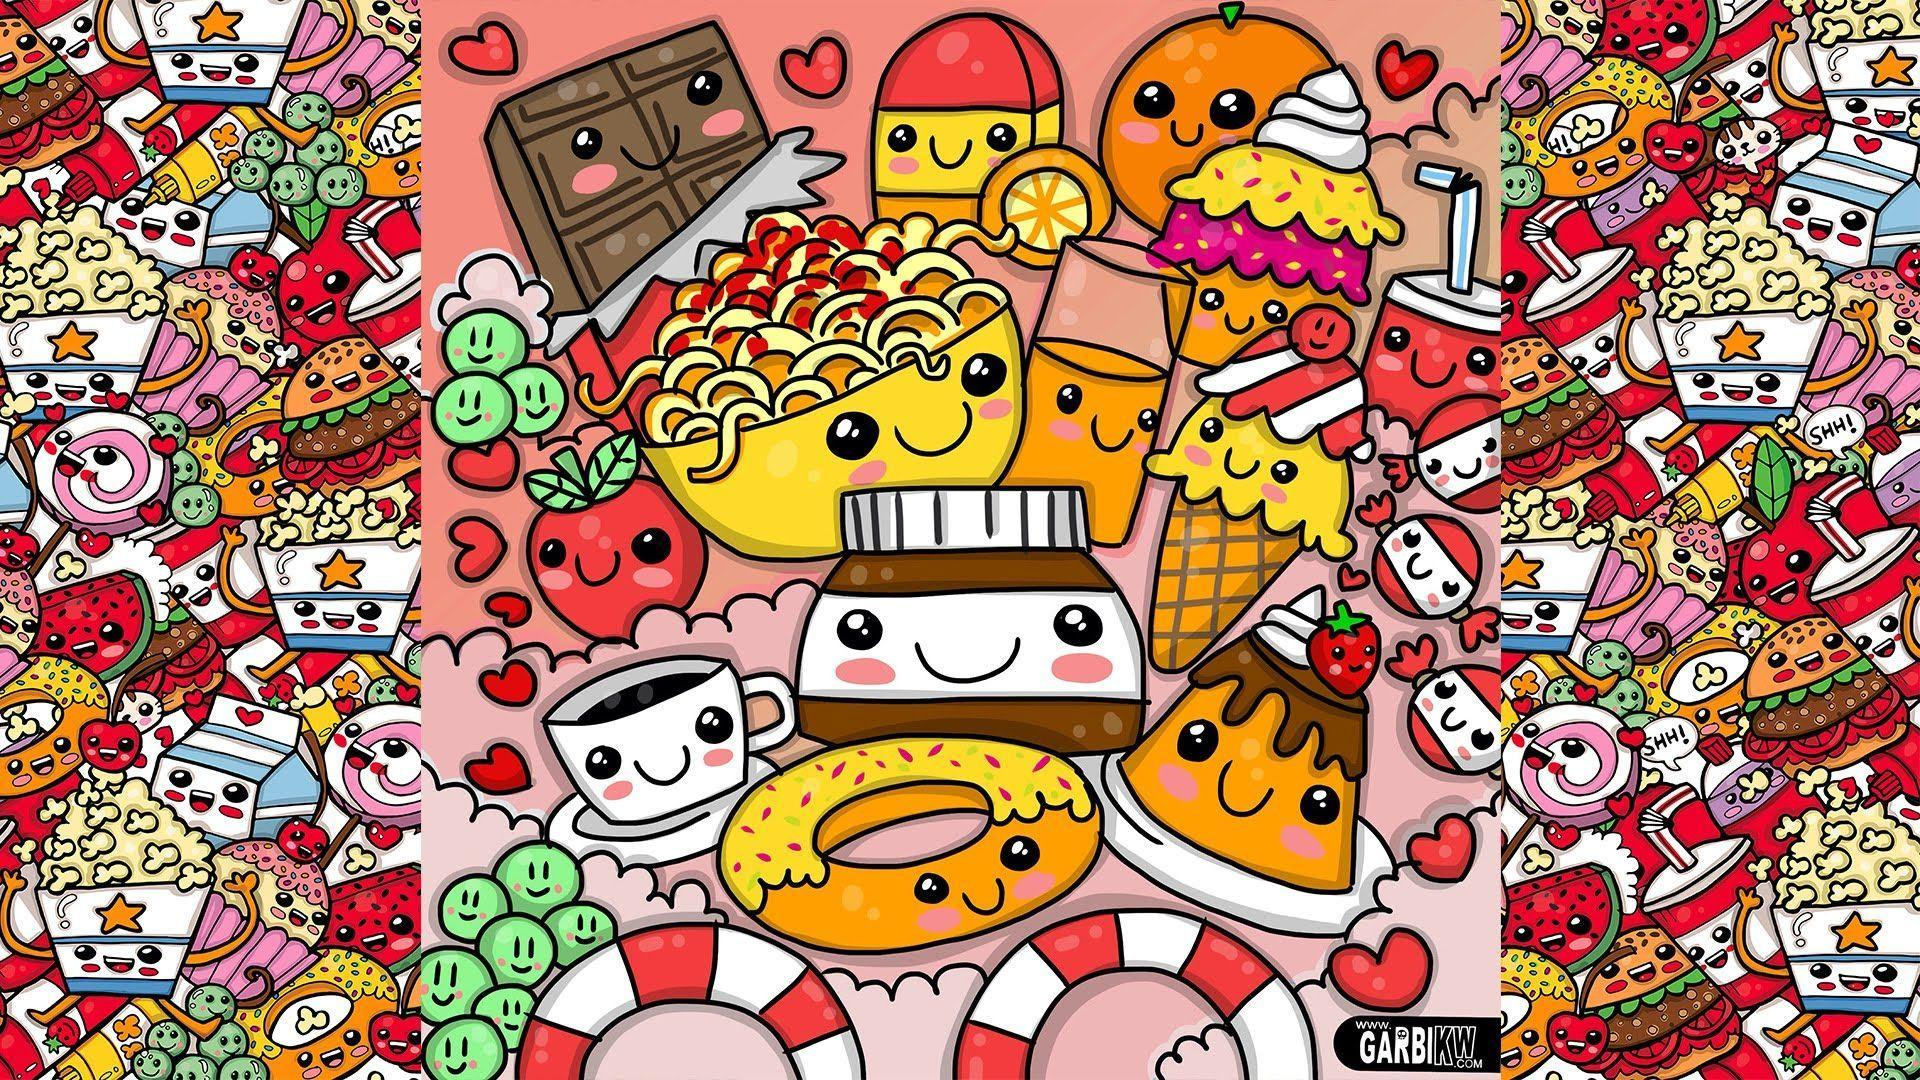 Cute Doodle Wallpapers - Wallpaper Cave